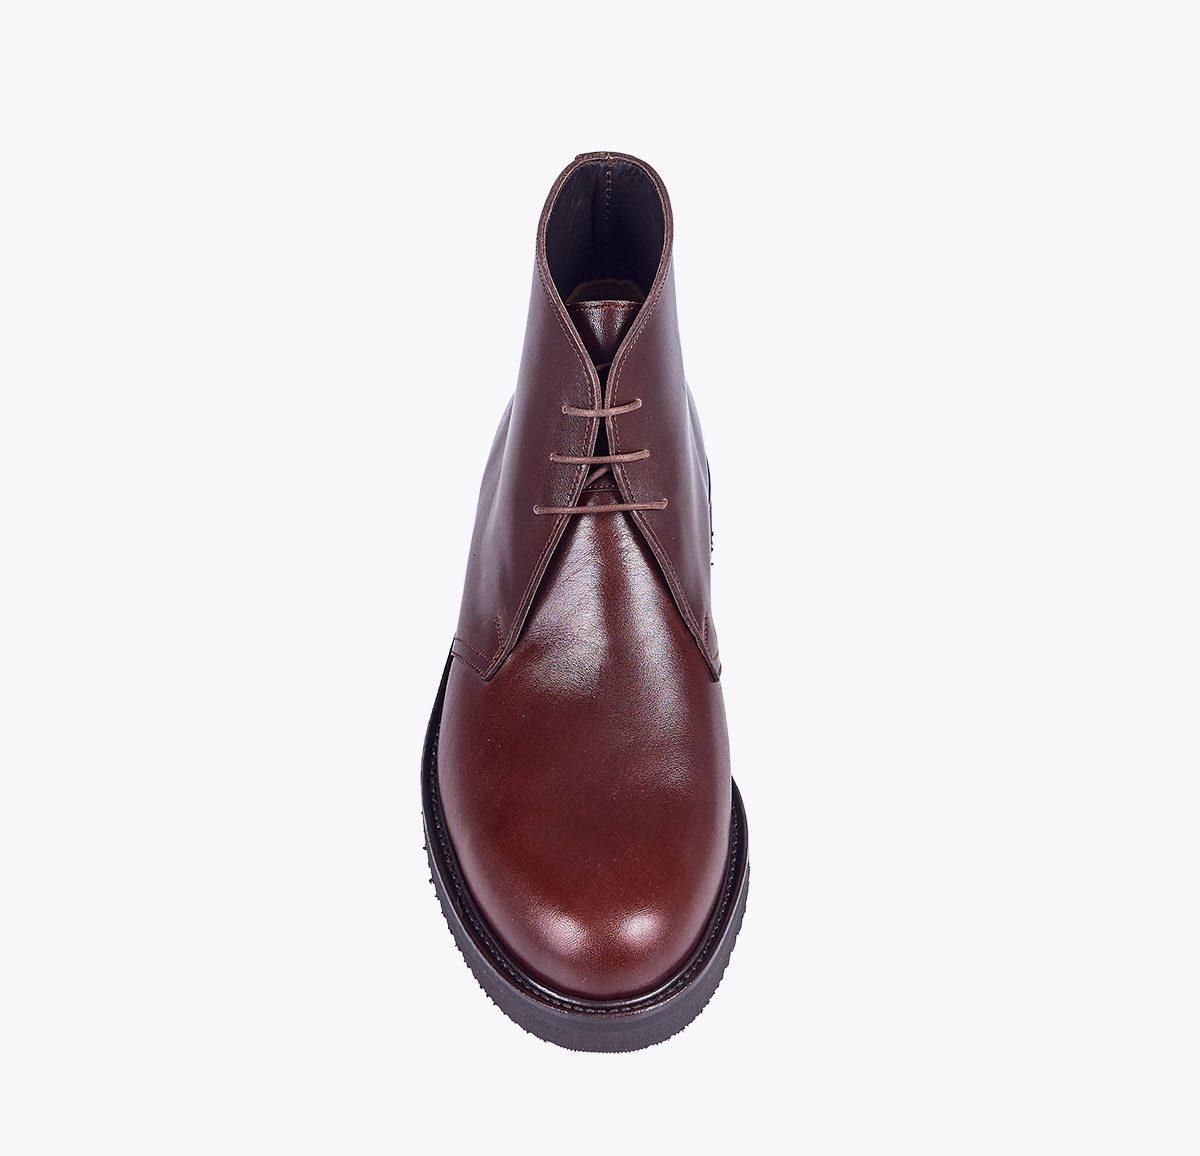 Botín Urban, tailor made shoes, schuhe nach mass en mandalashoes Santanyí Mallorca